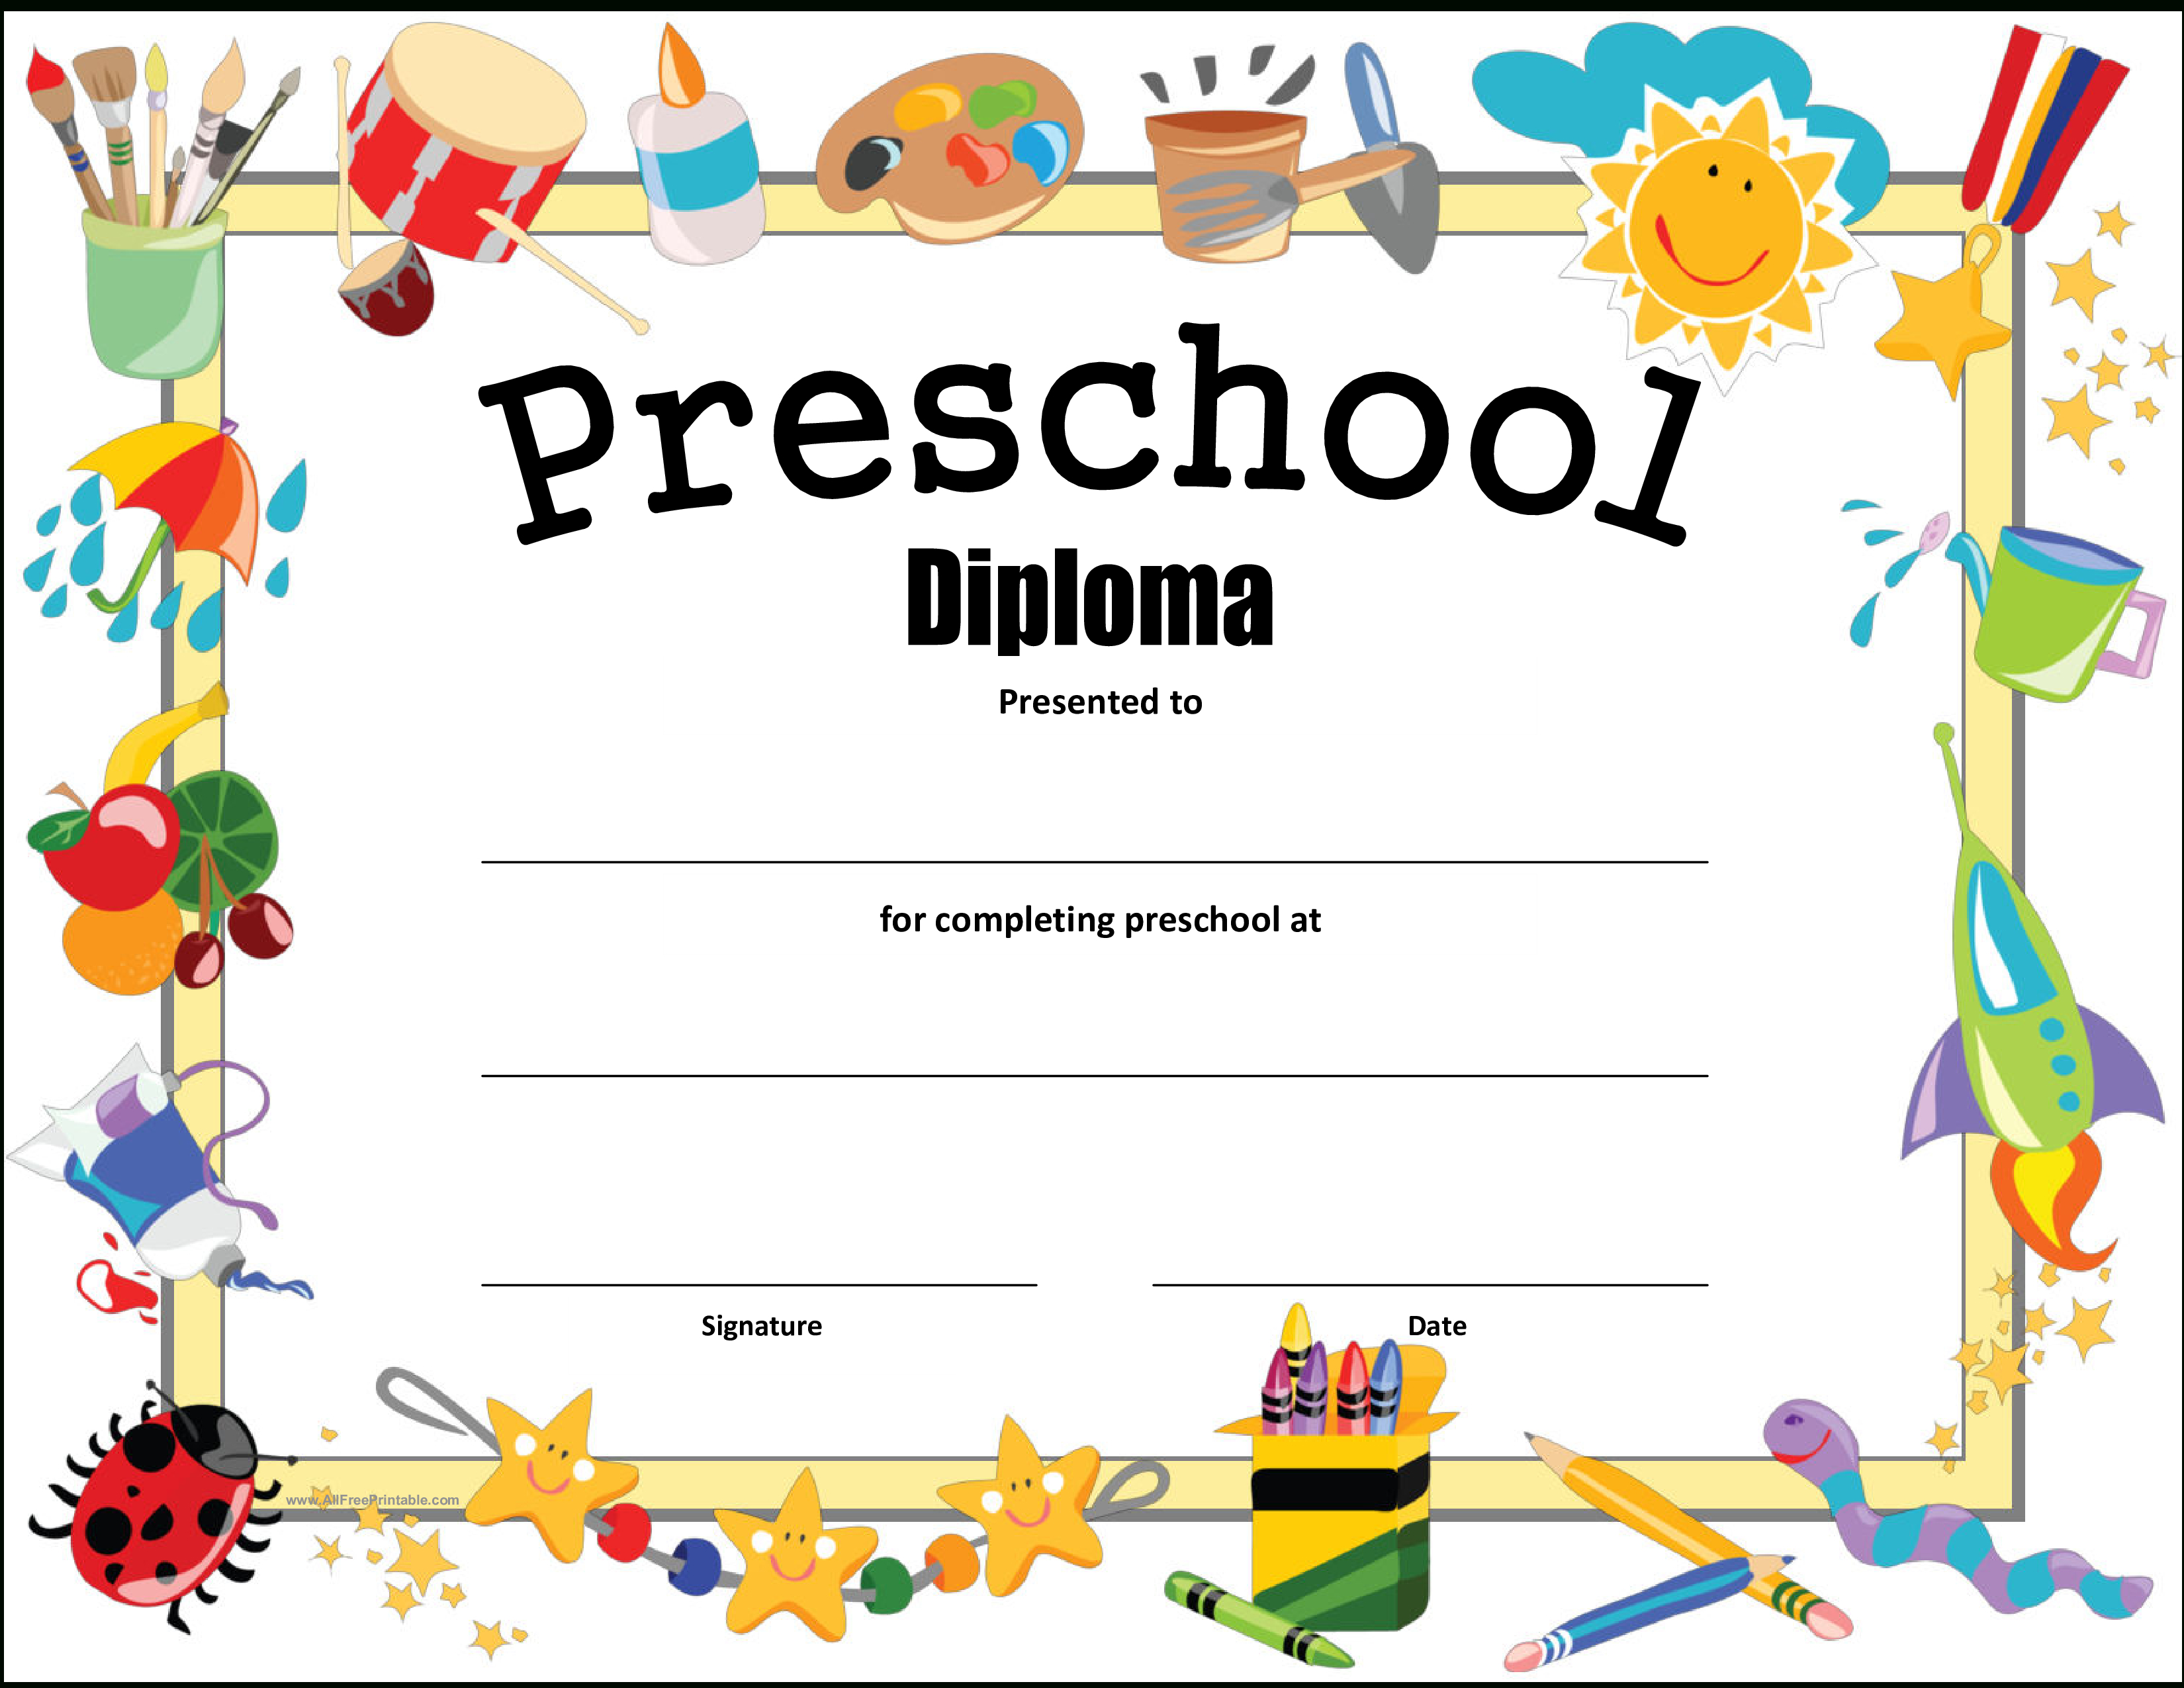 Preschool Diploma Certificate - How To Make A Preschool Diploma - Free Printable Preschool Diplomas